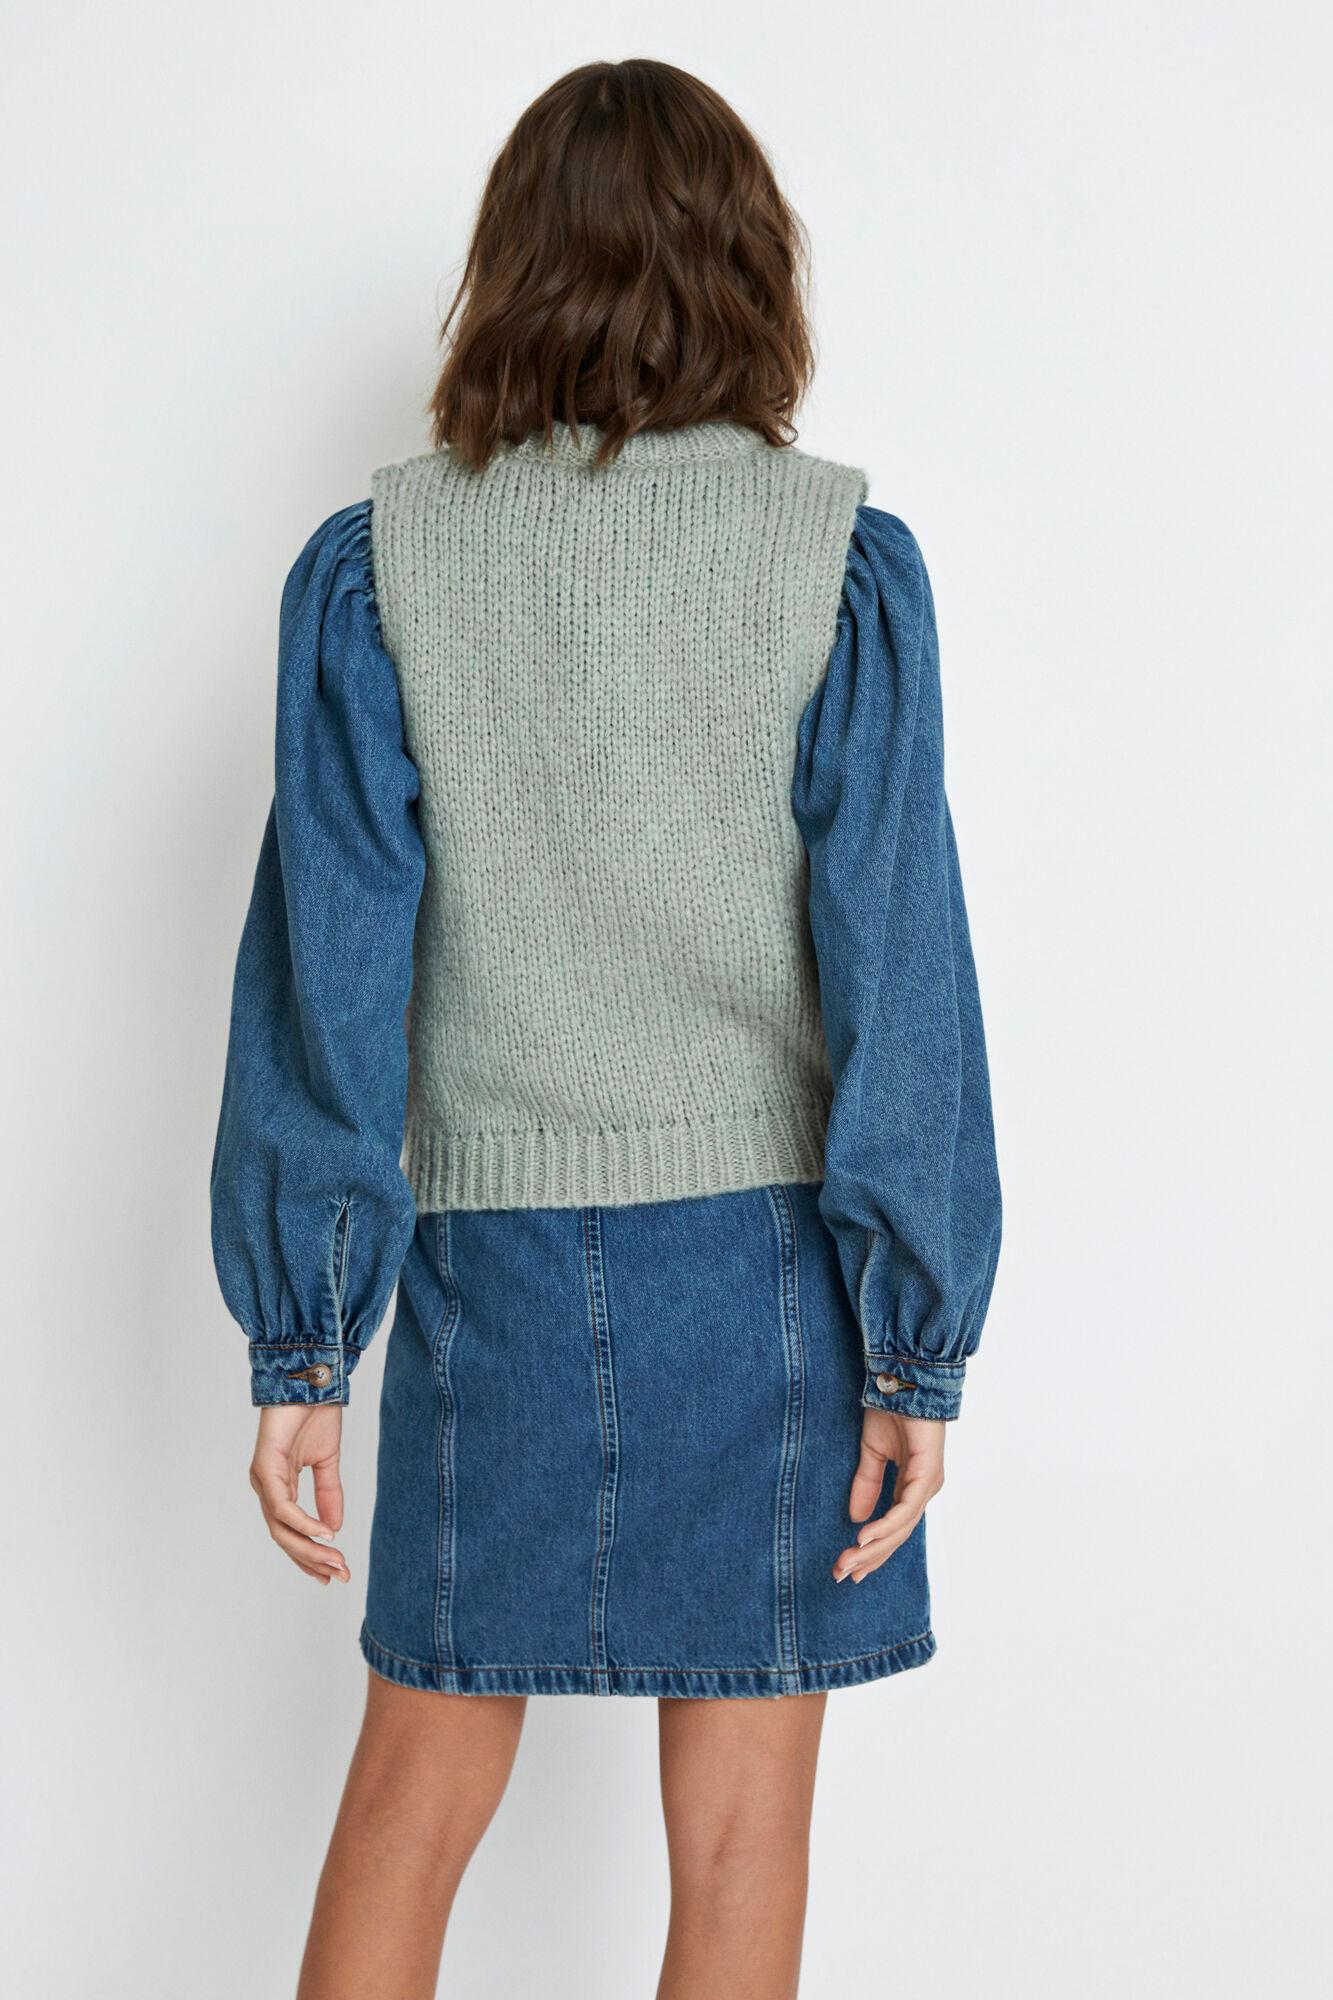 Envii Entrepka SL knit, chinois mel, x-small